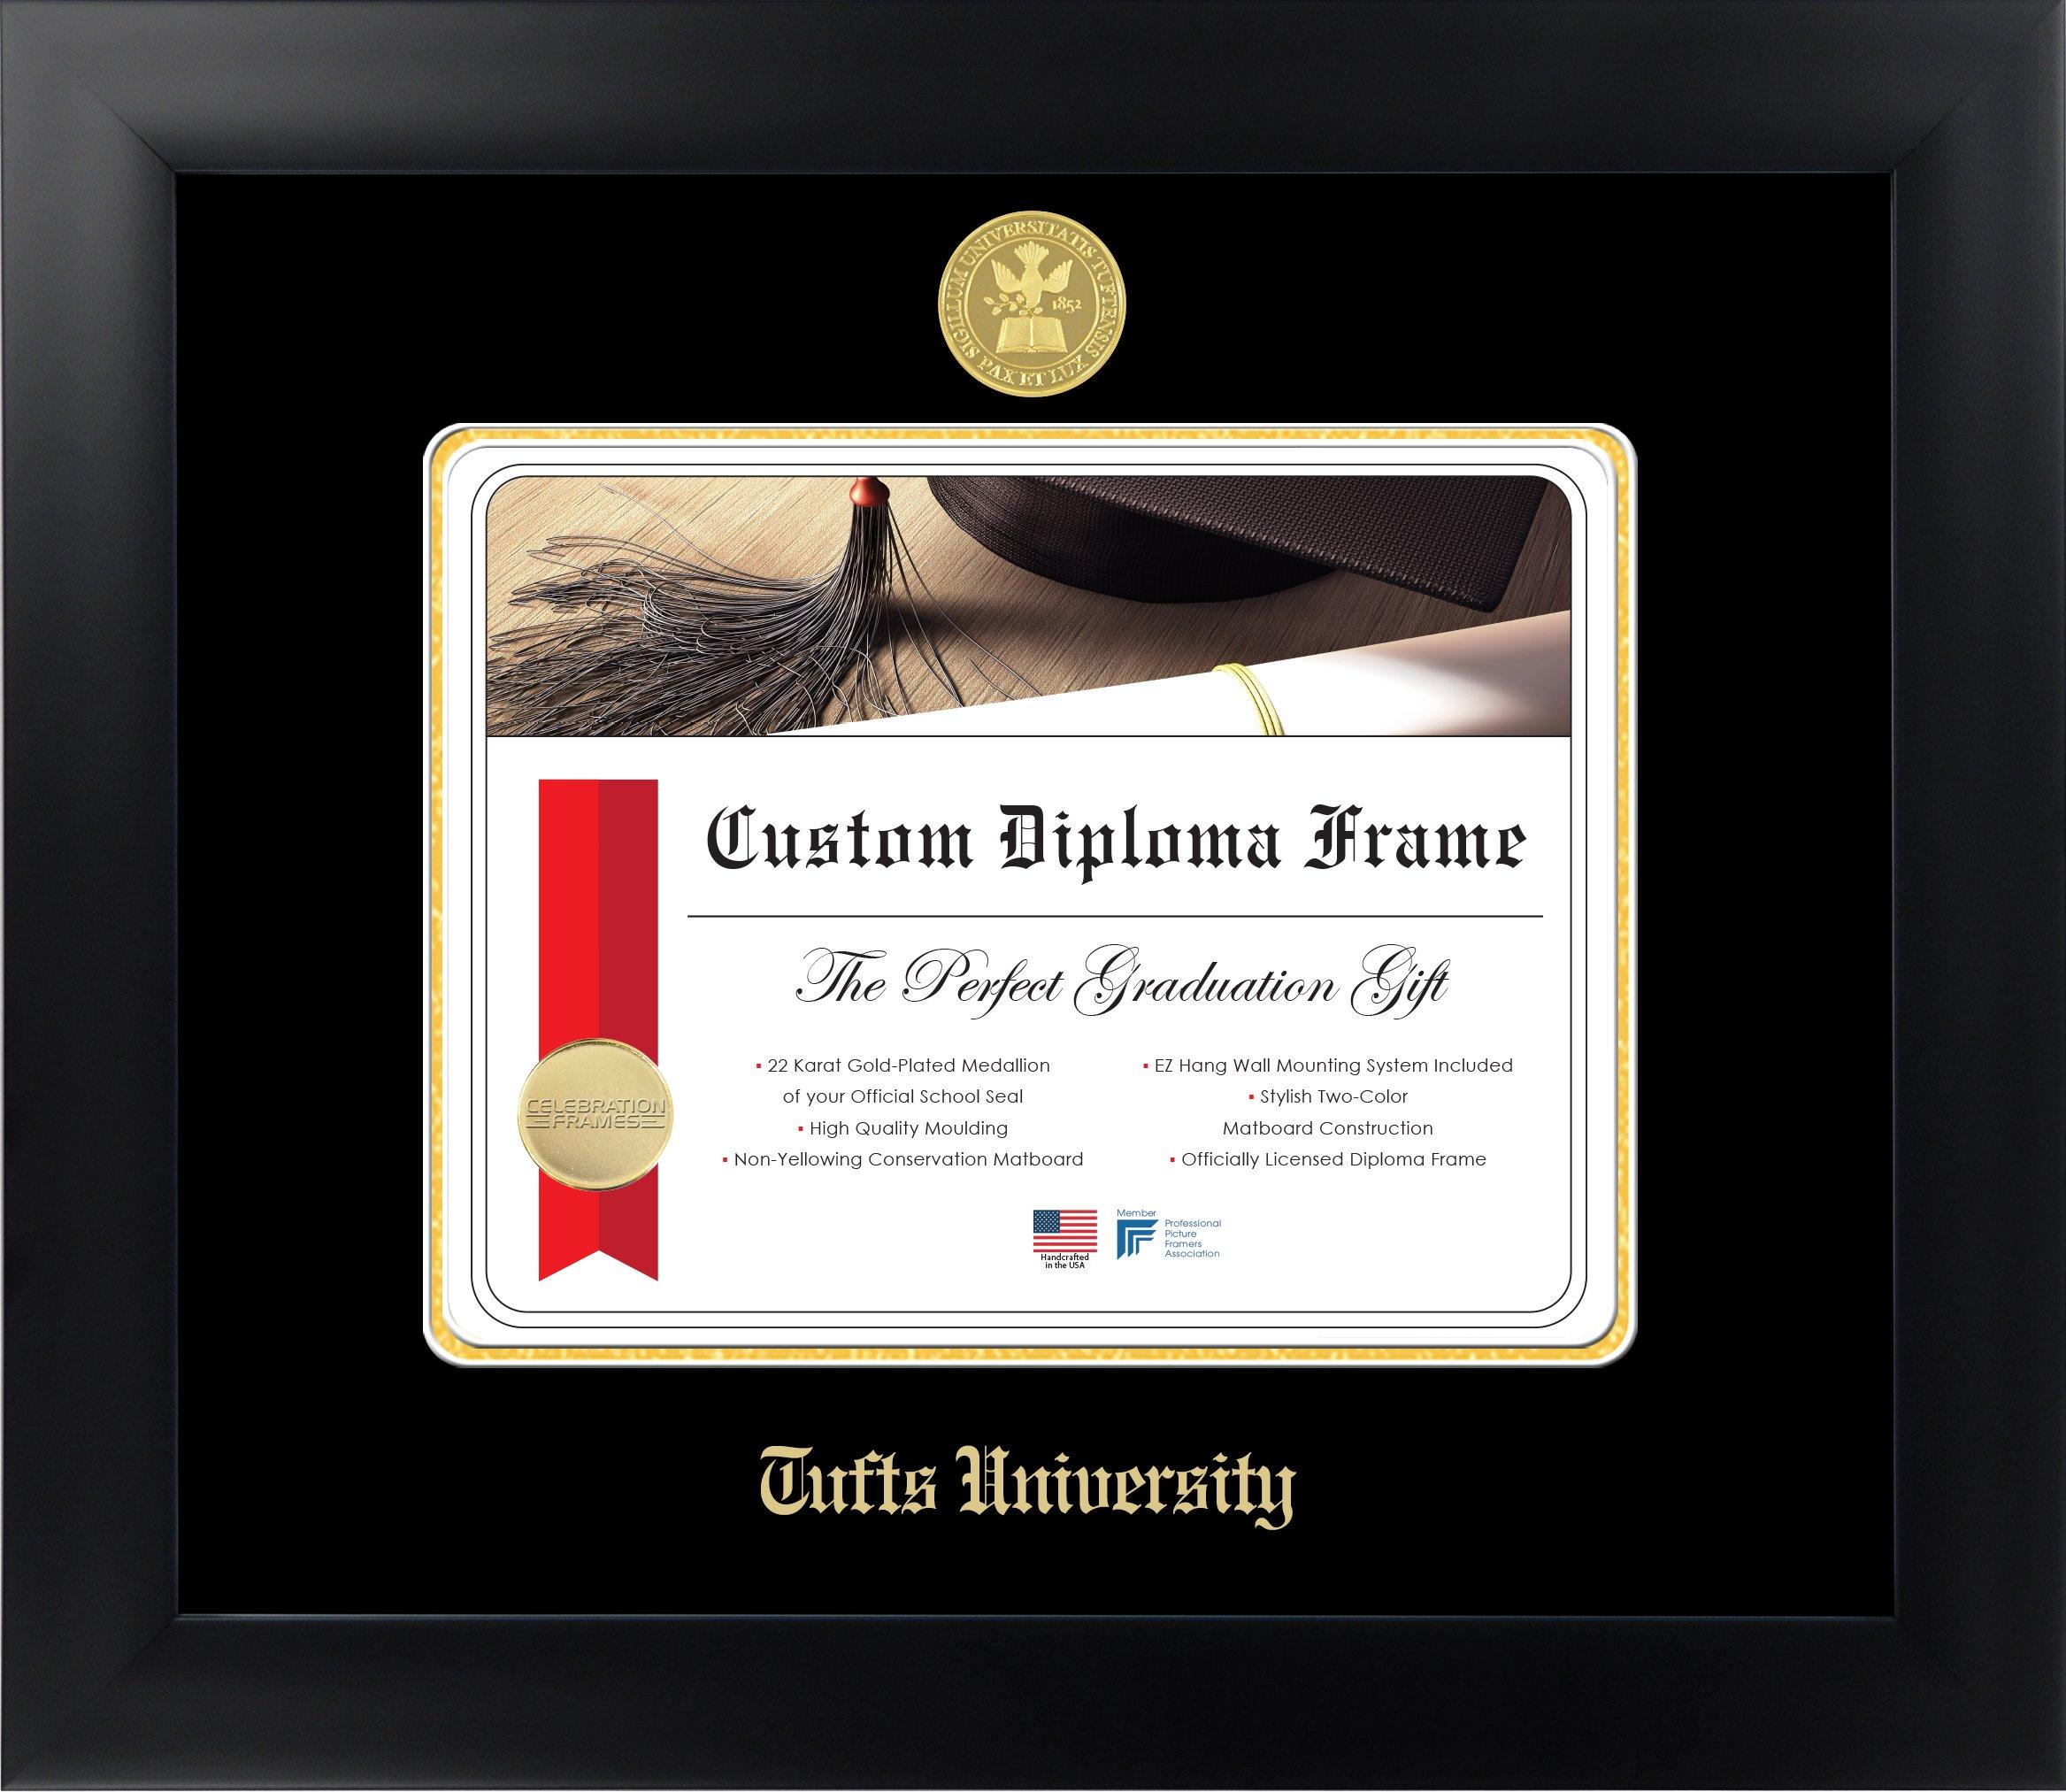 Tufts University 8½ x 11 Matte Black Finish Infinity Diploma Frame by Celebration Frames